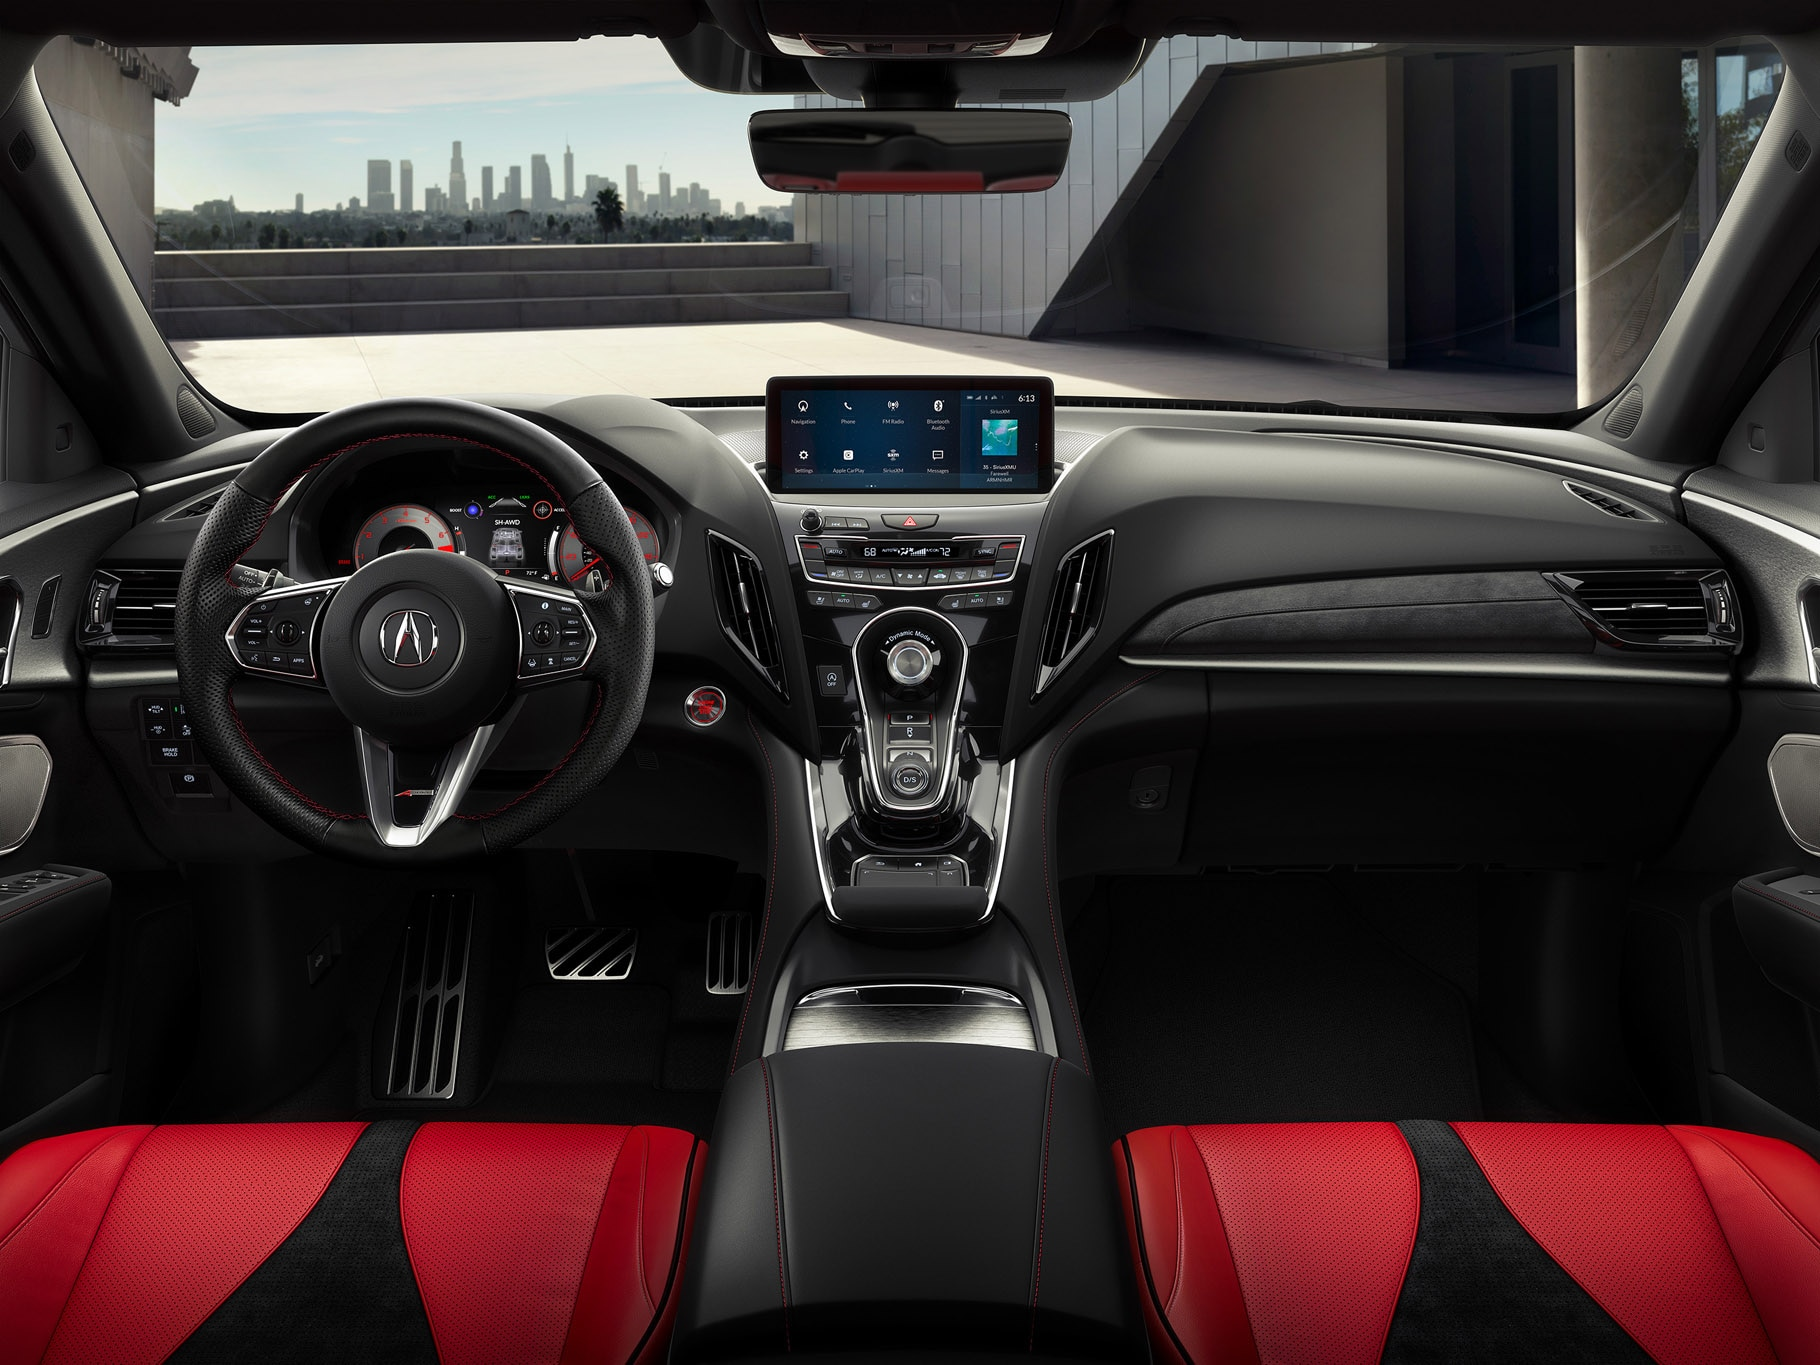 2019 Acura RDX Receives an A-Spec Variant | Automobile ...